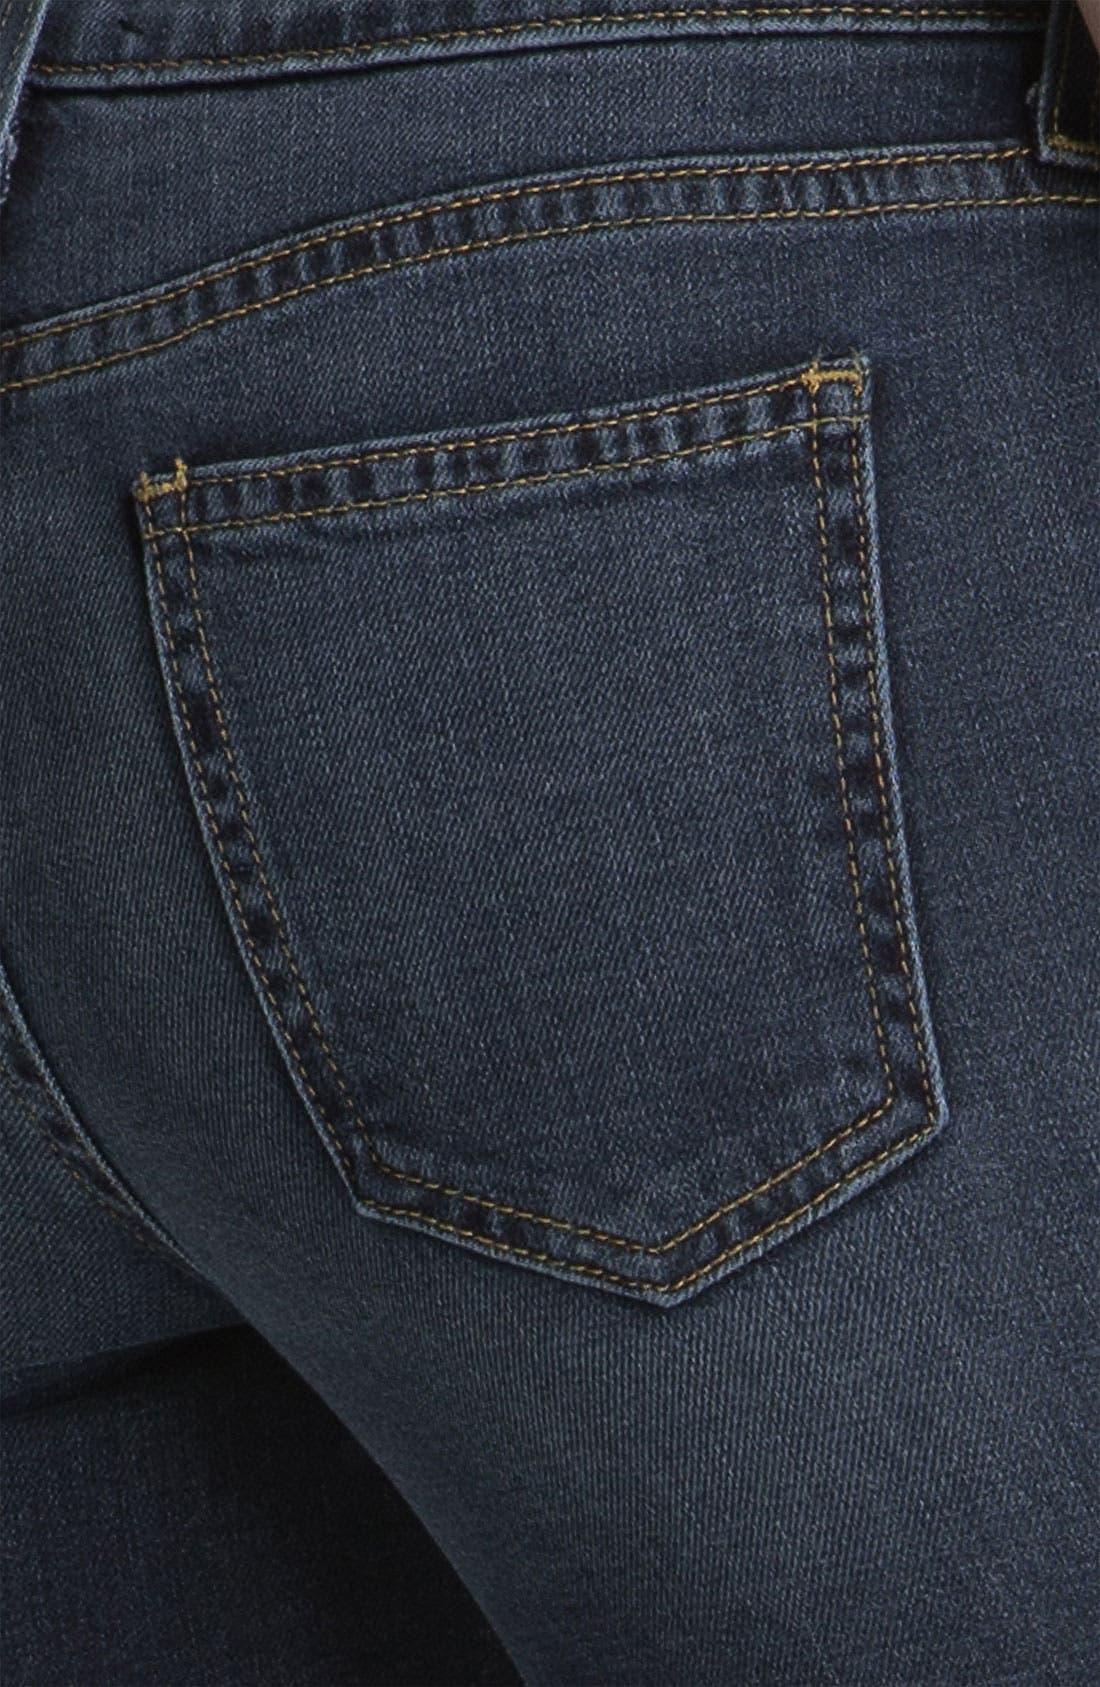 Alternate Image 3  - L'AGENCE 'Nicole' Skinny Jeans